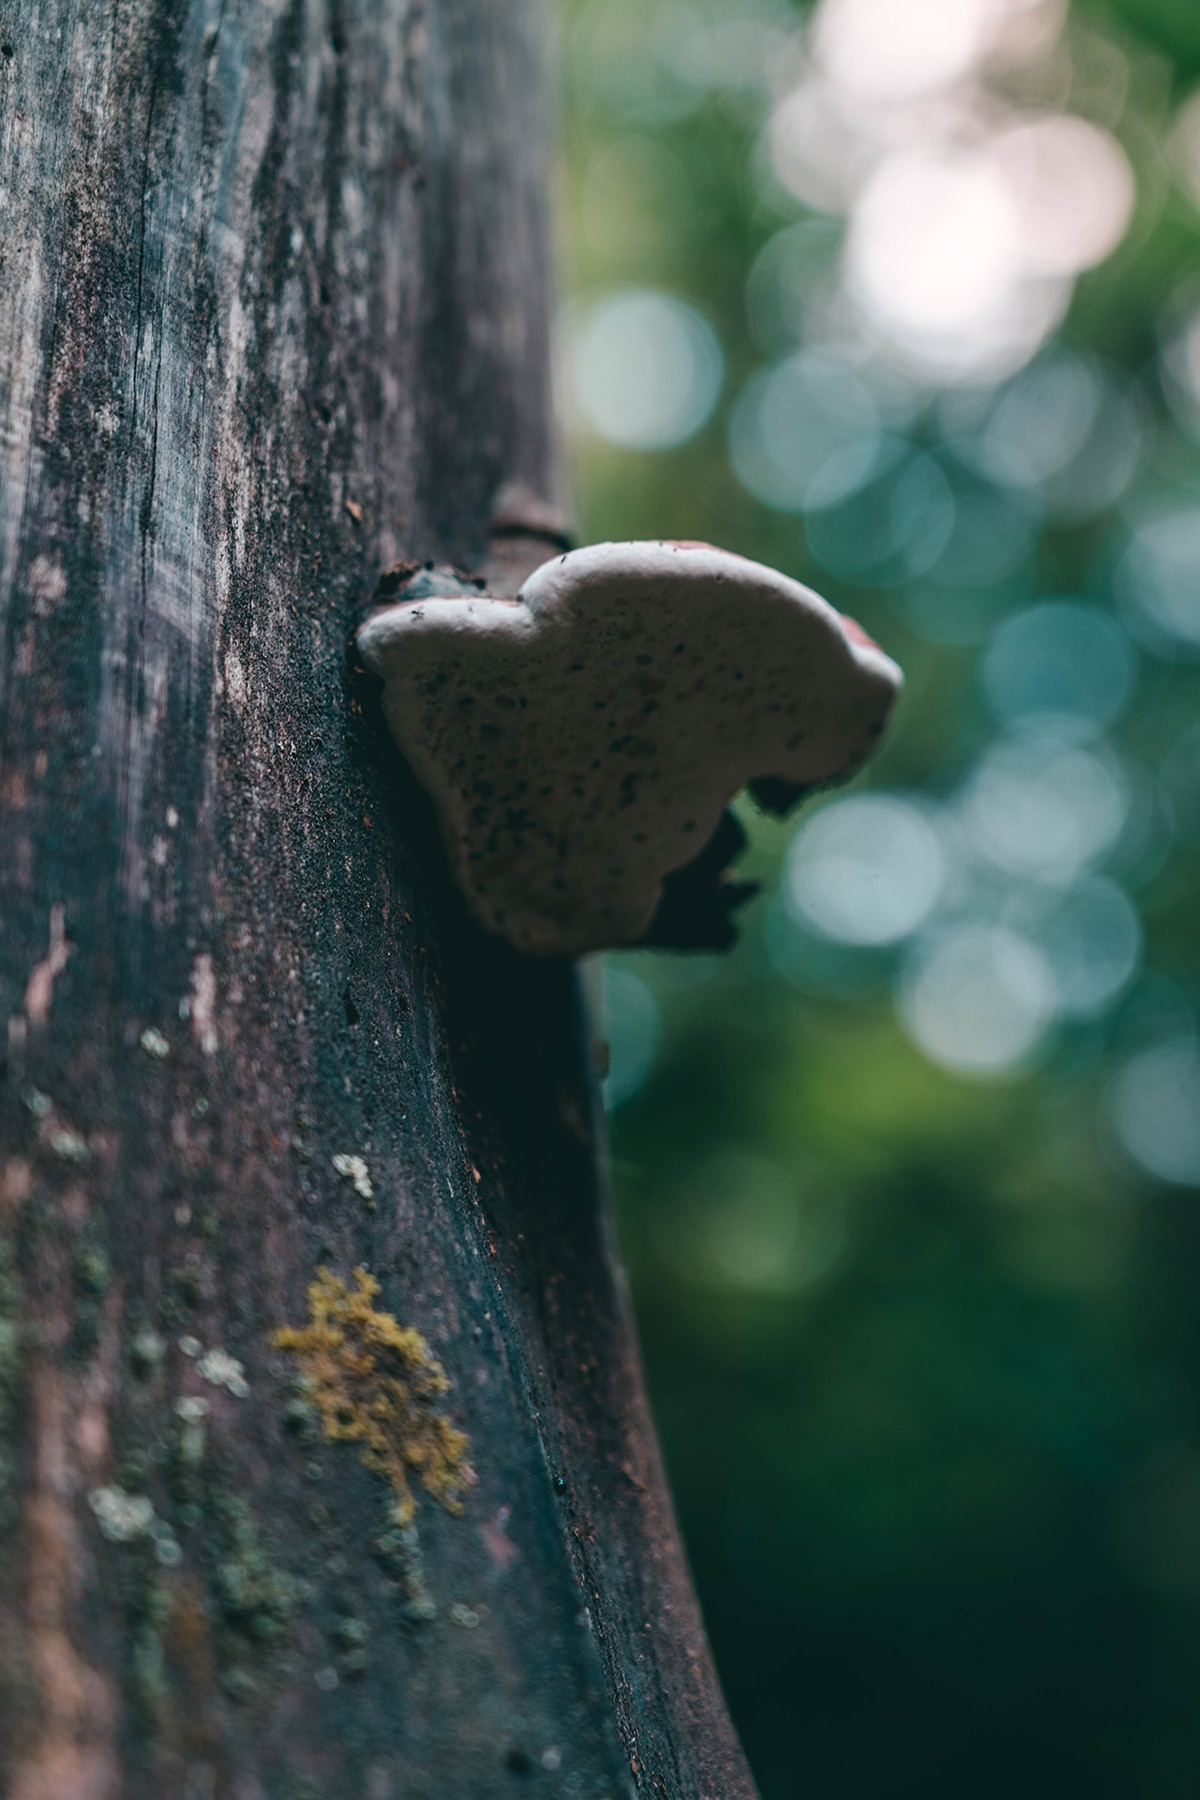 nationalpark-bayerischer-wald-baumpilz